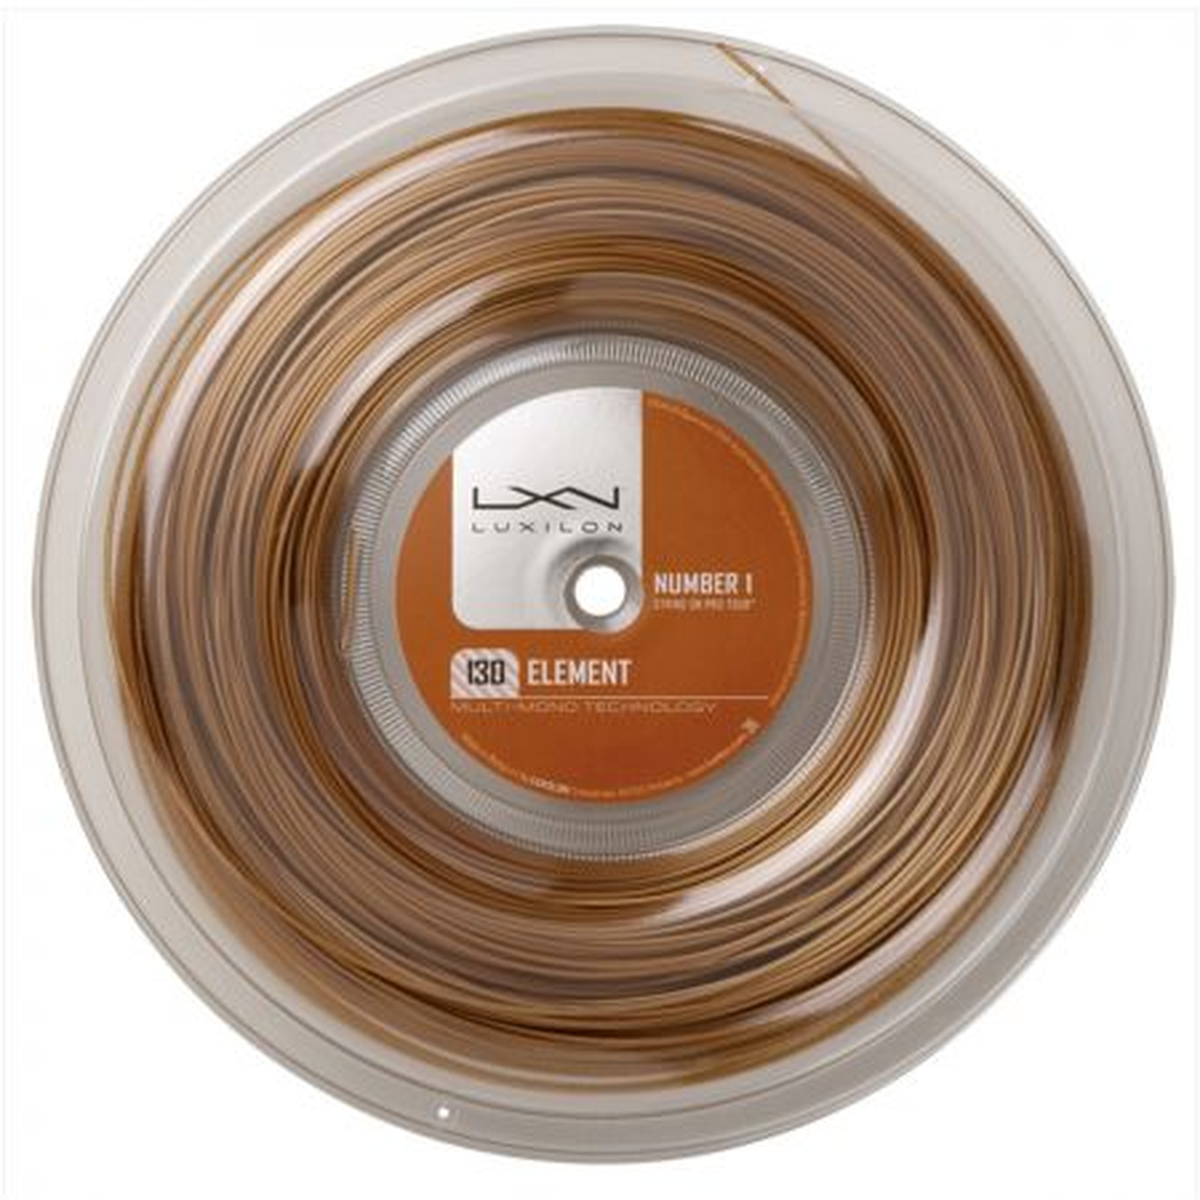 Wilson Element 1.30mm x 200m žica za reket